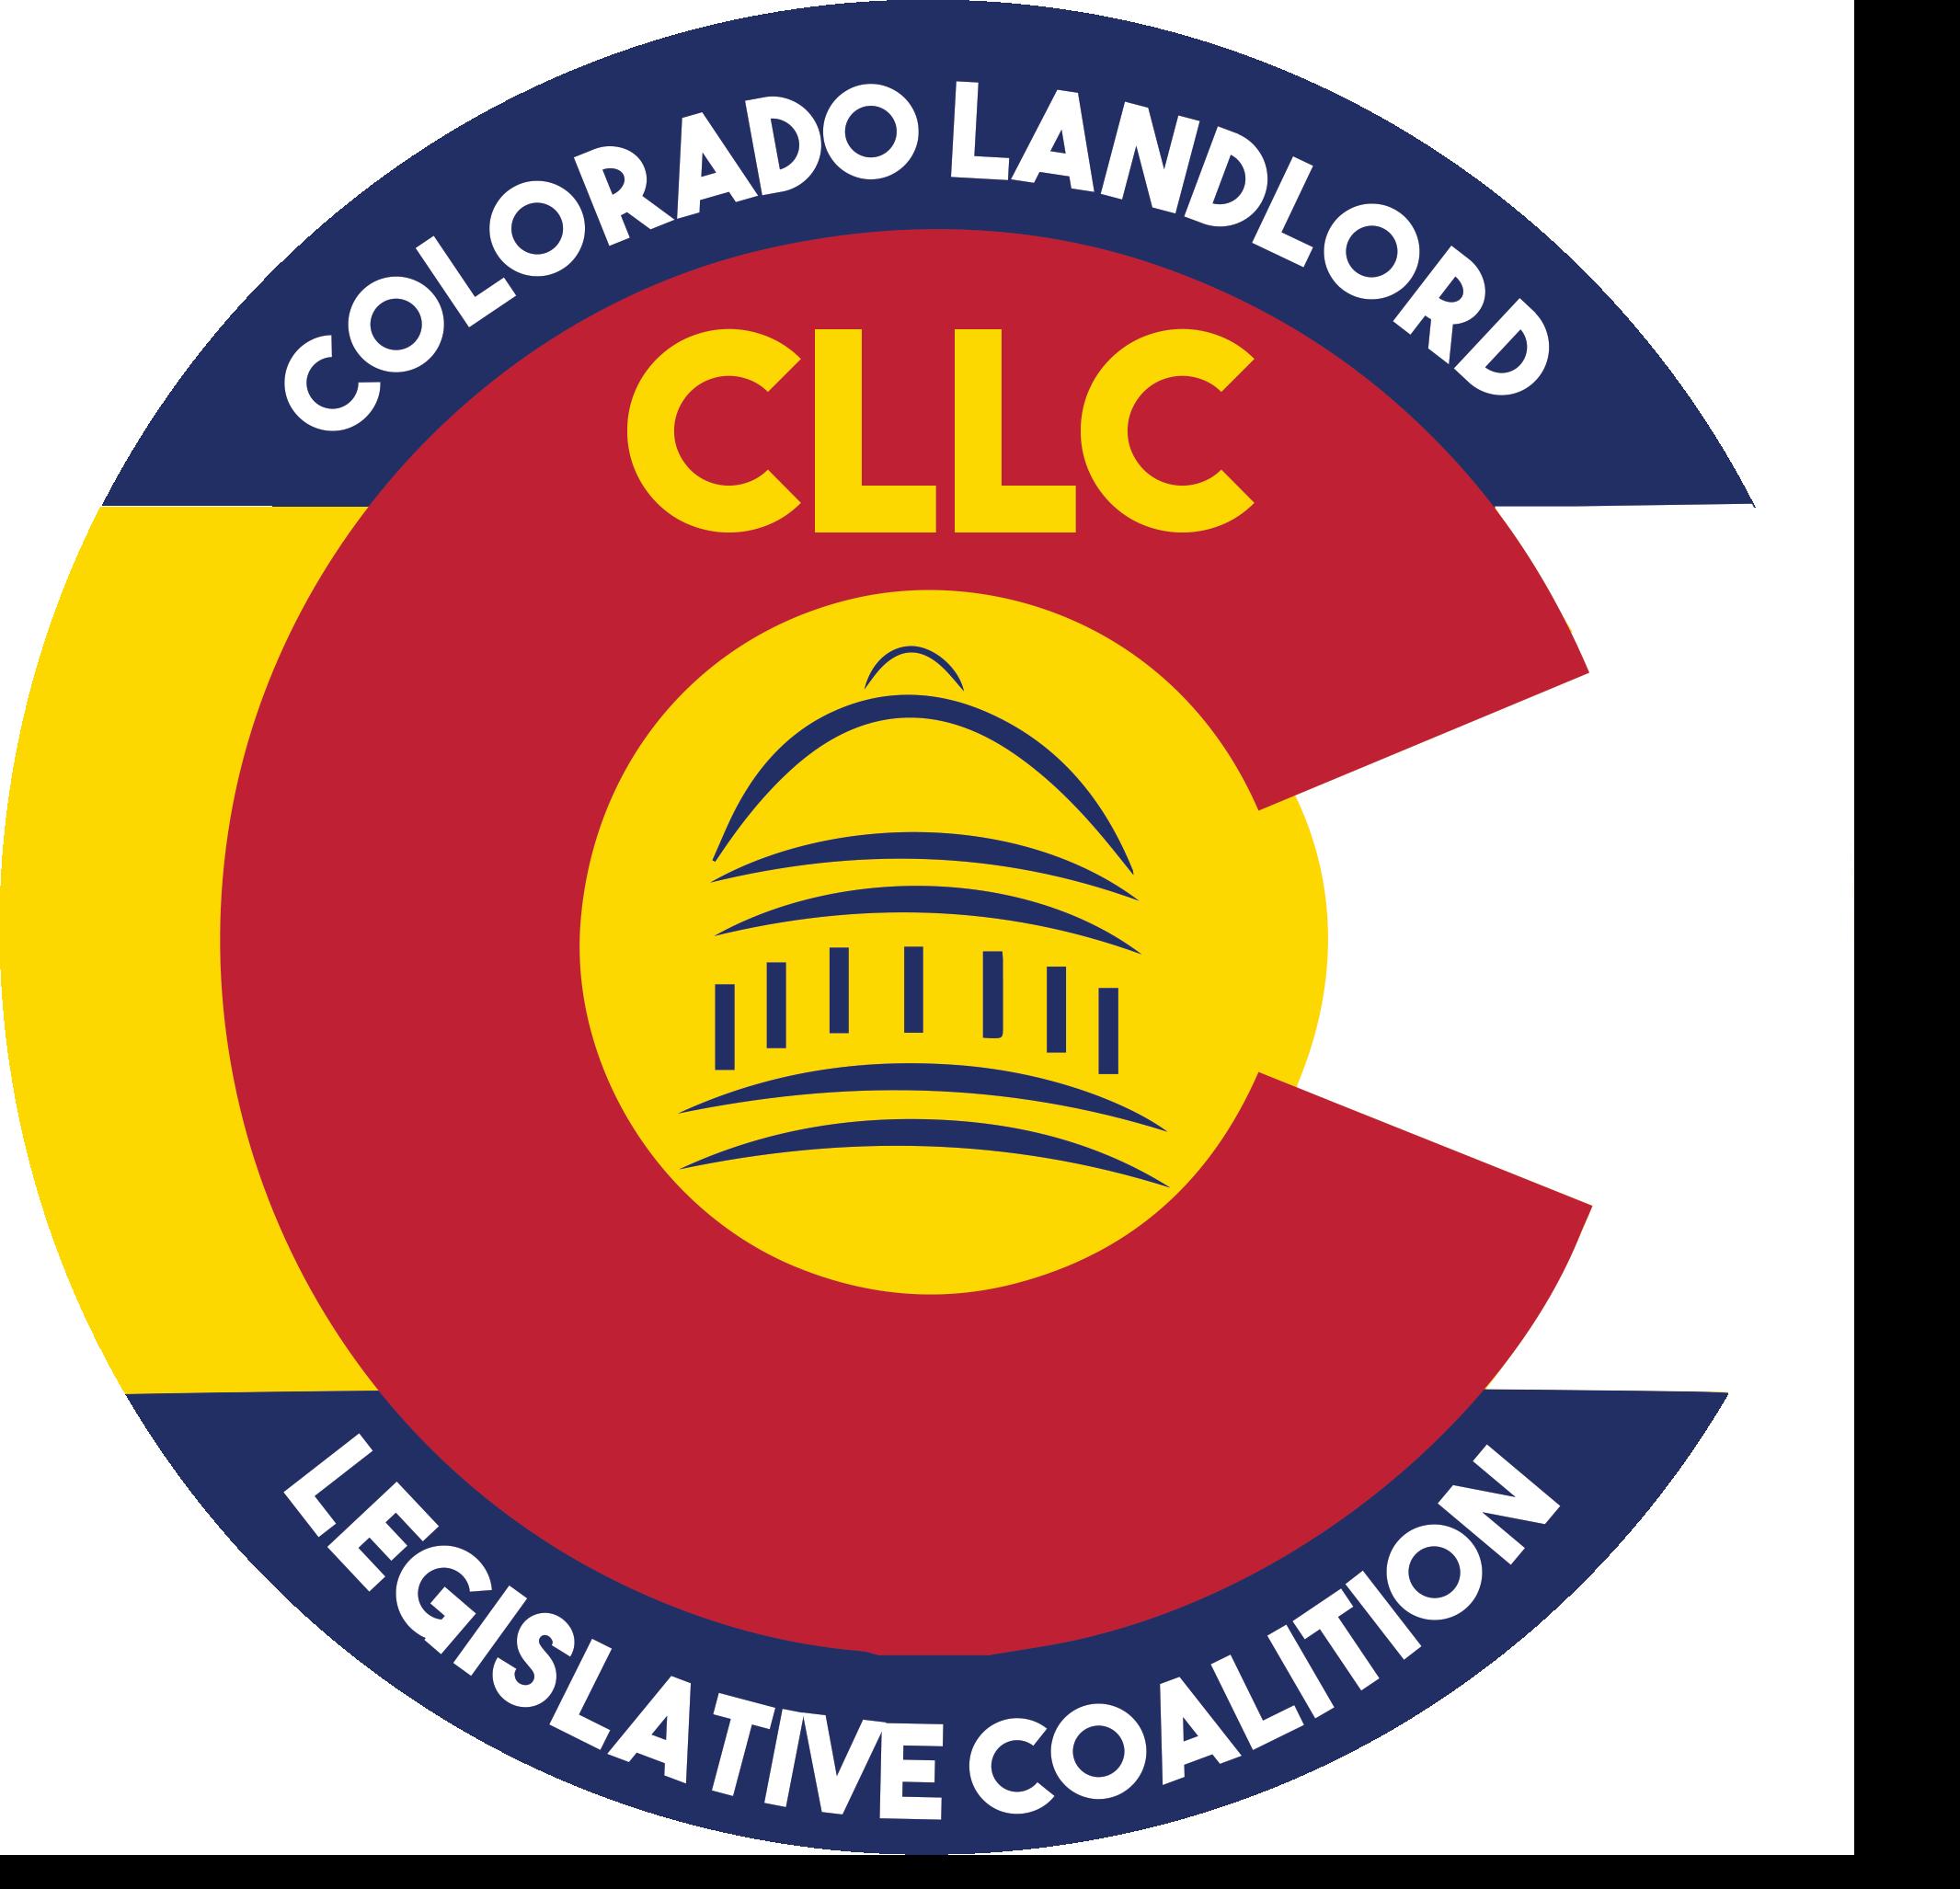 CLLC_CAPITAL